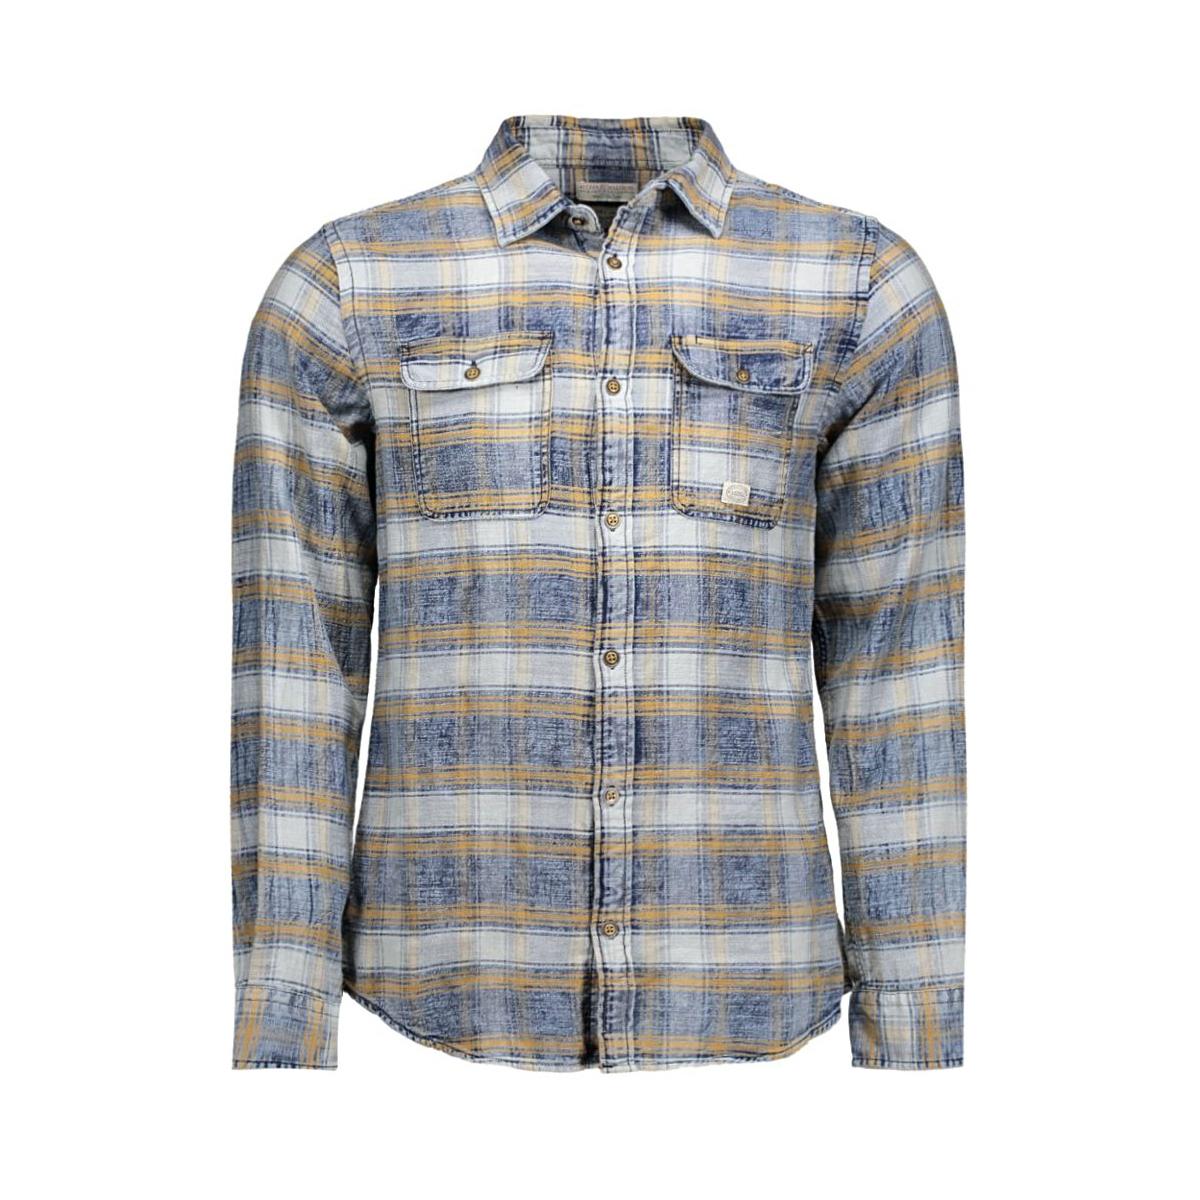 jjvauburn shirt l/s utility auw 12107982 jack & jones overhemd narcissus